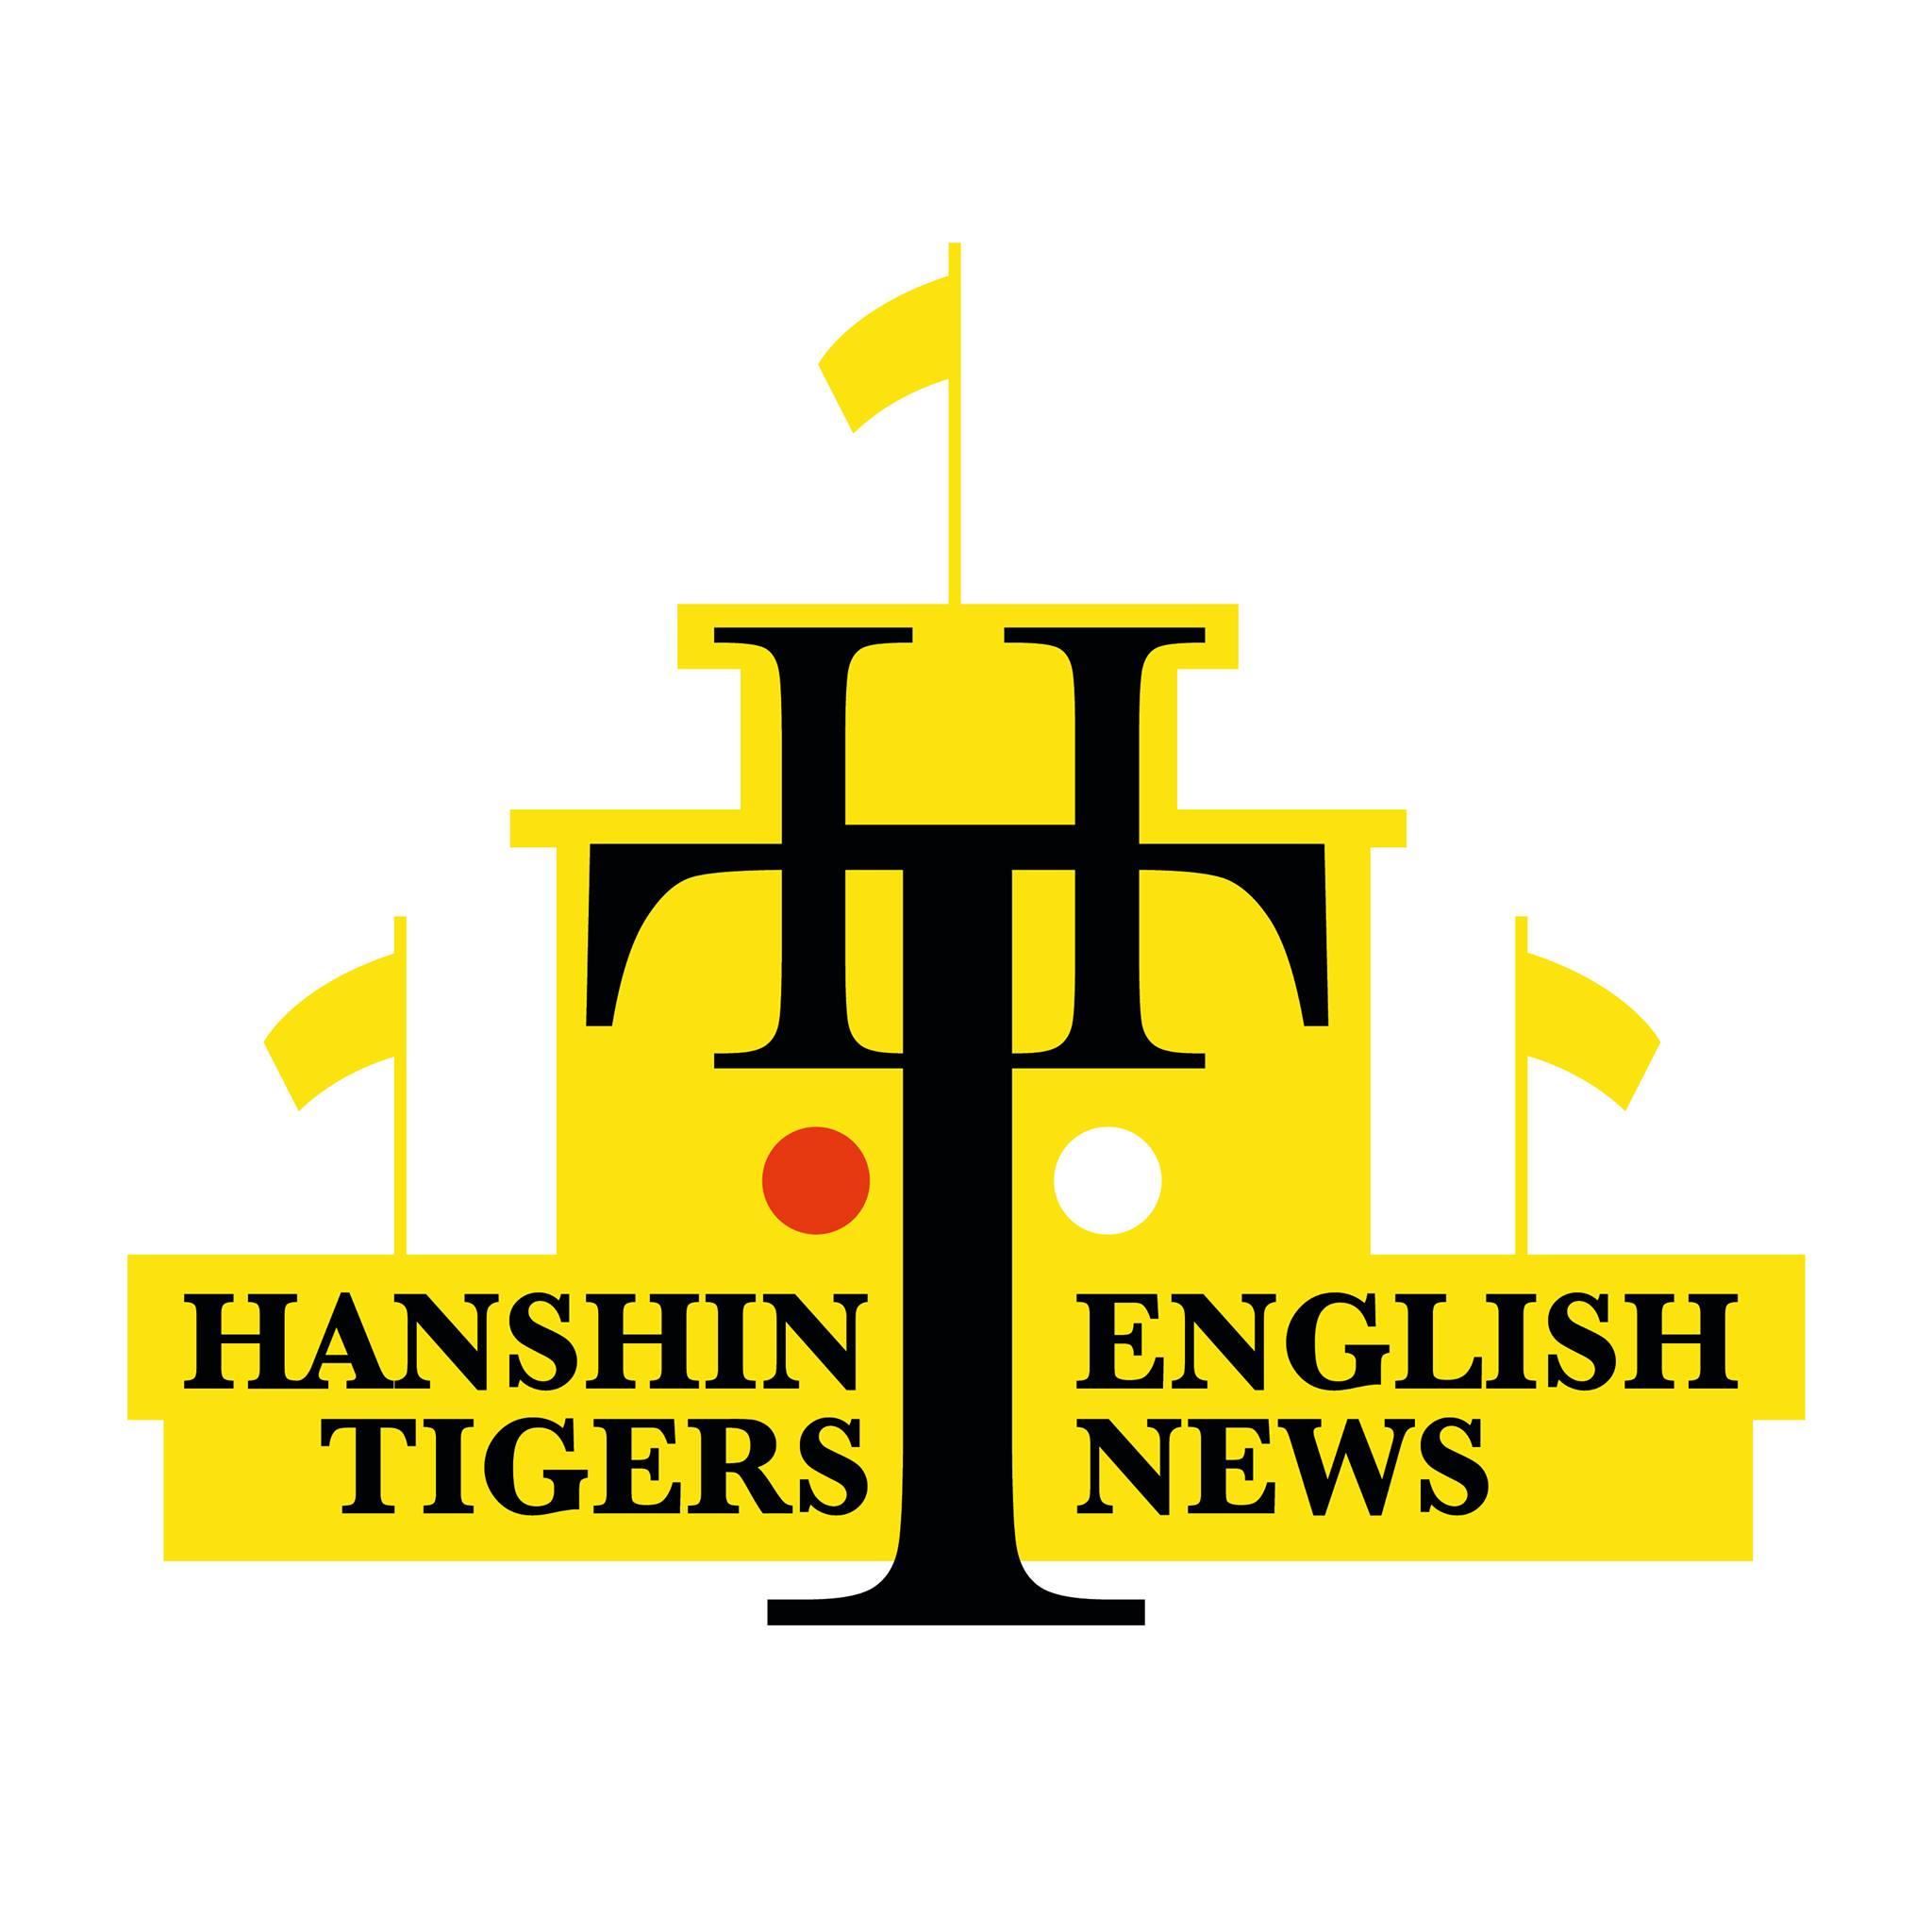 H-TEN - Hanshin Tigers English News